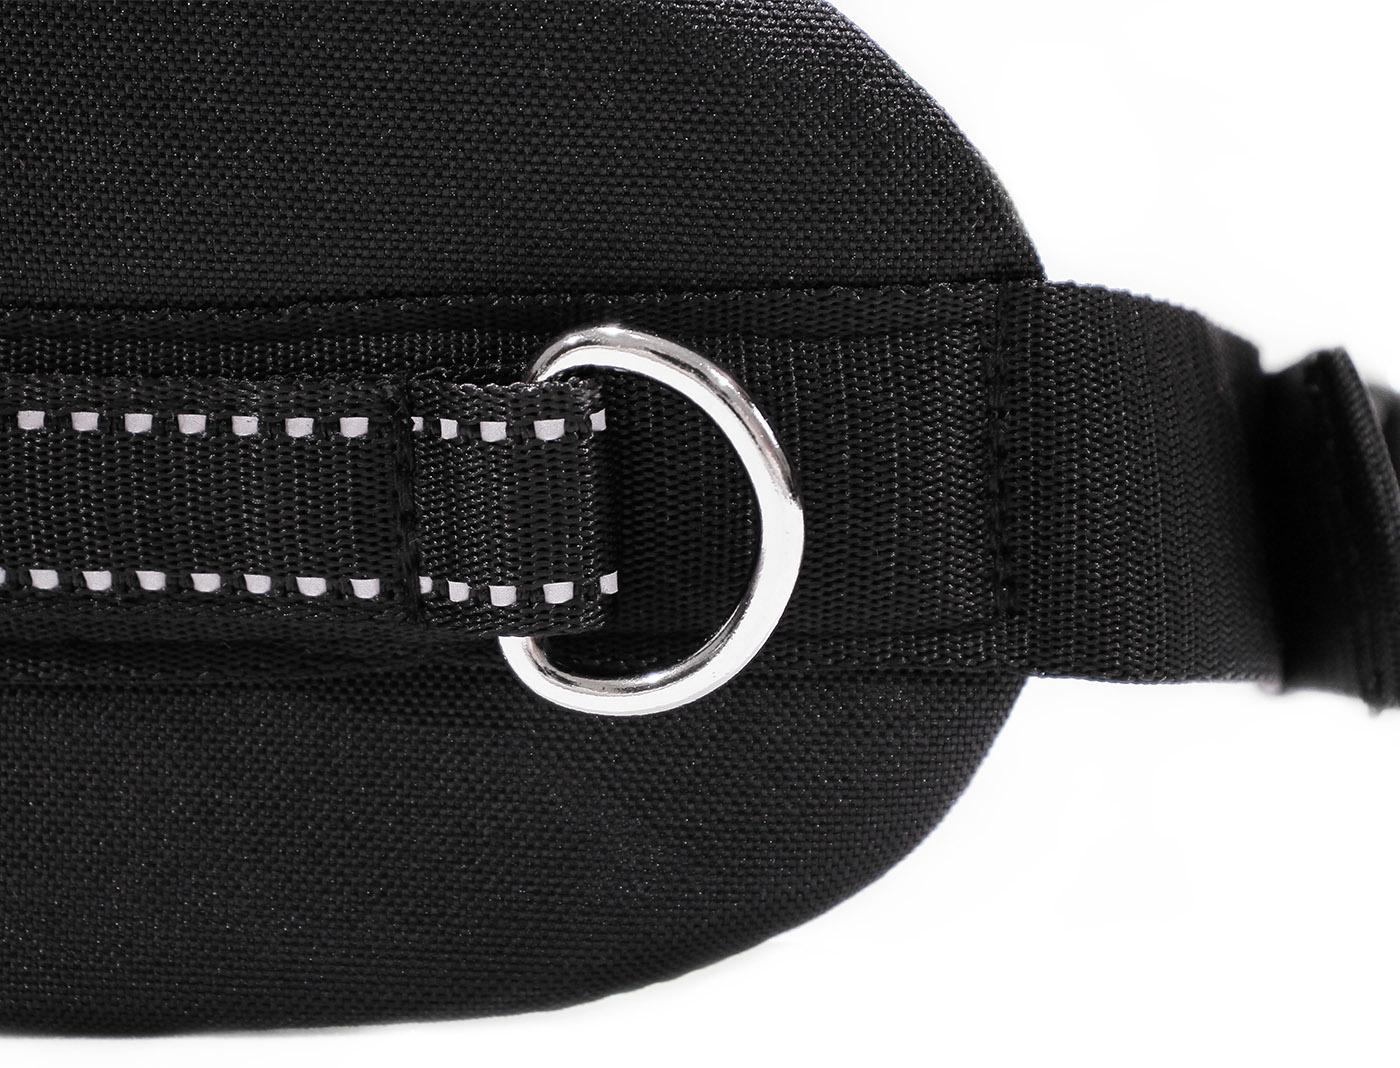 LasaLine Handsfree Dog Walking Running Jogging Waist Belt -  dark bluee Pedding/ black with reflectors